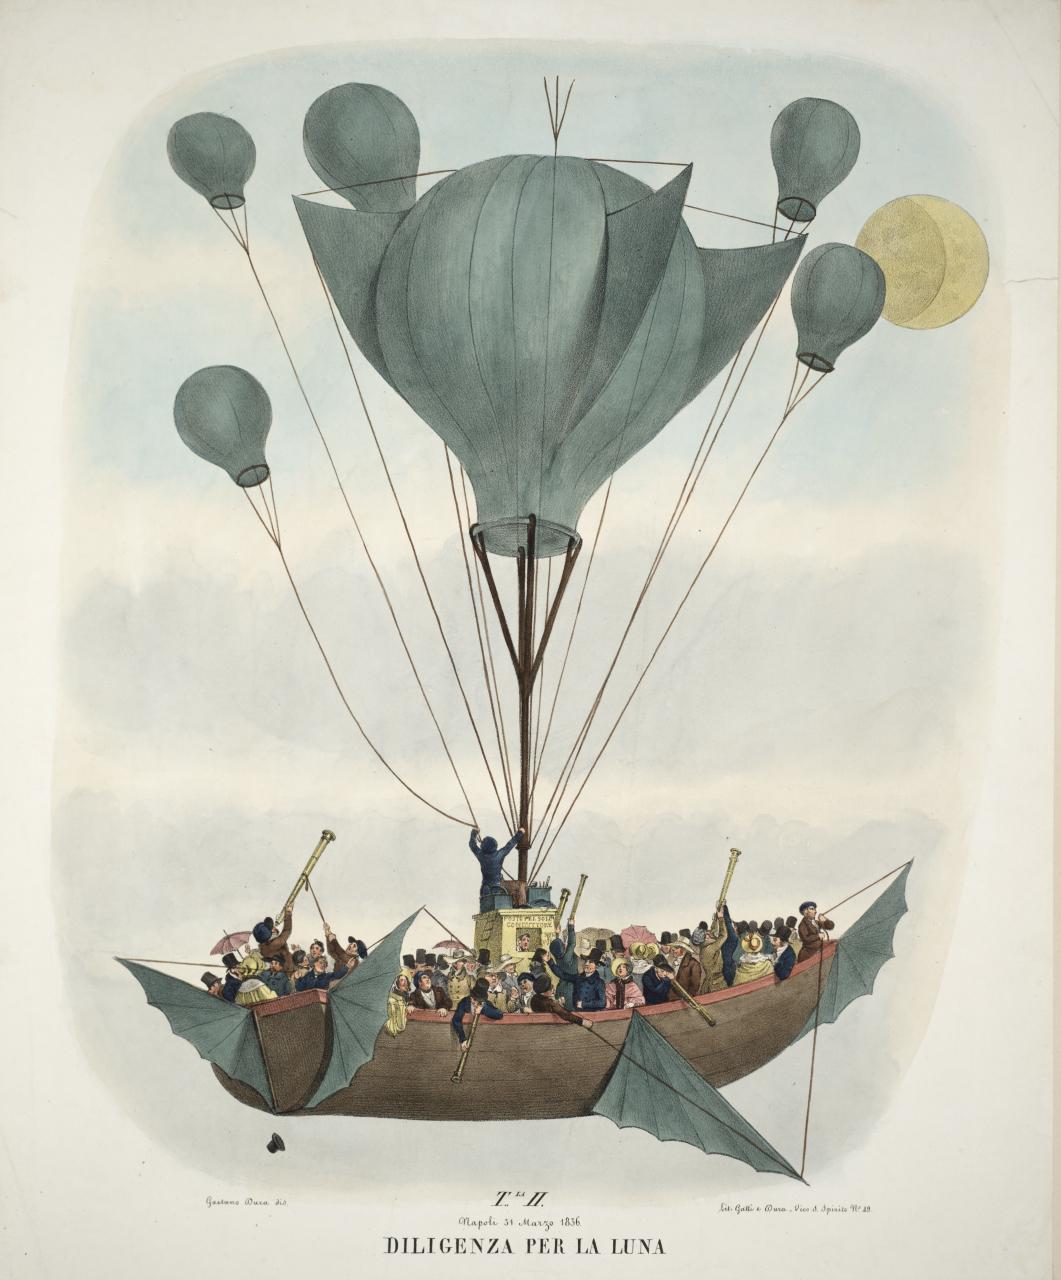 Illustration from Leopoldo Galluzzo's 'Altre scoverte fatte nella luna dal Sigr. Herschel [Other lunar discoveries from Signor Herschel]' (Naples, 1836) (courtesy Smithsonian Libraries)